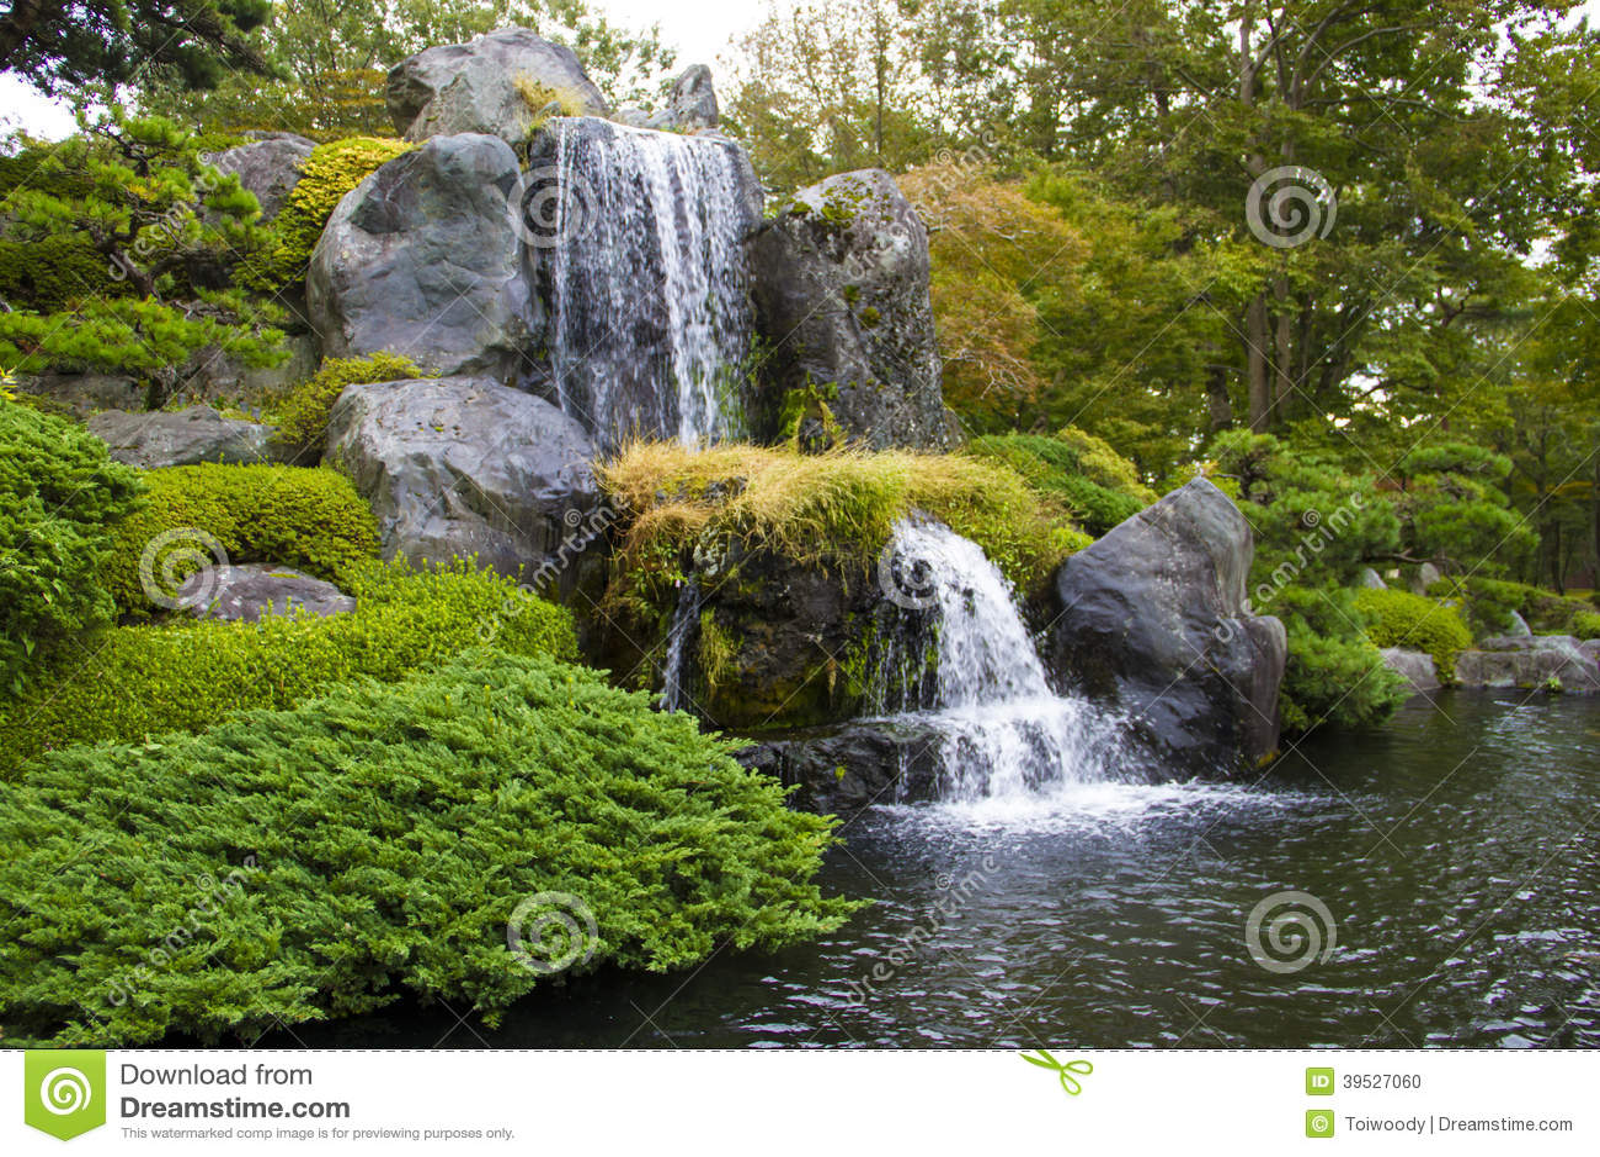 Wasserfall In Garten